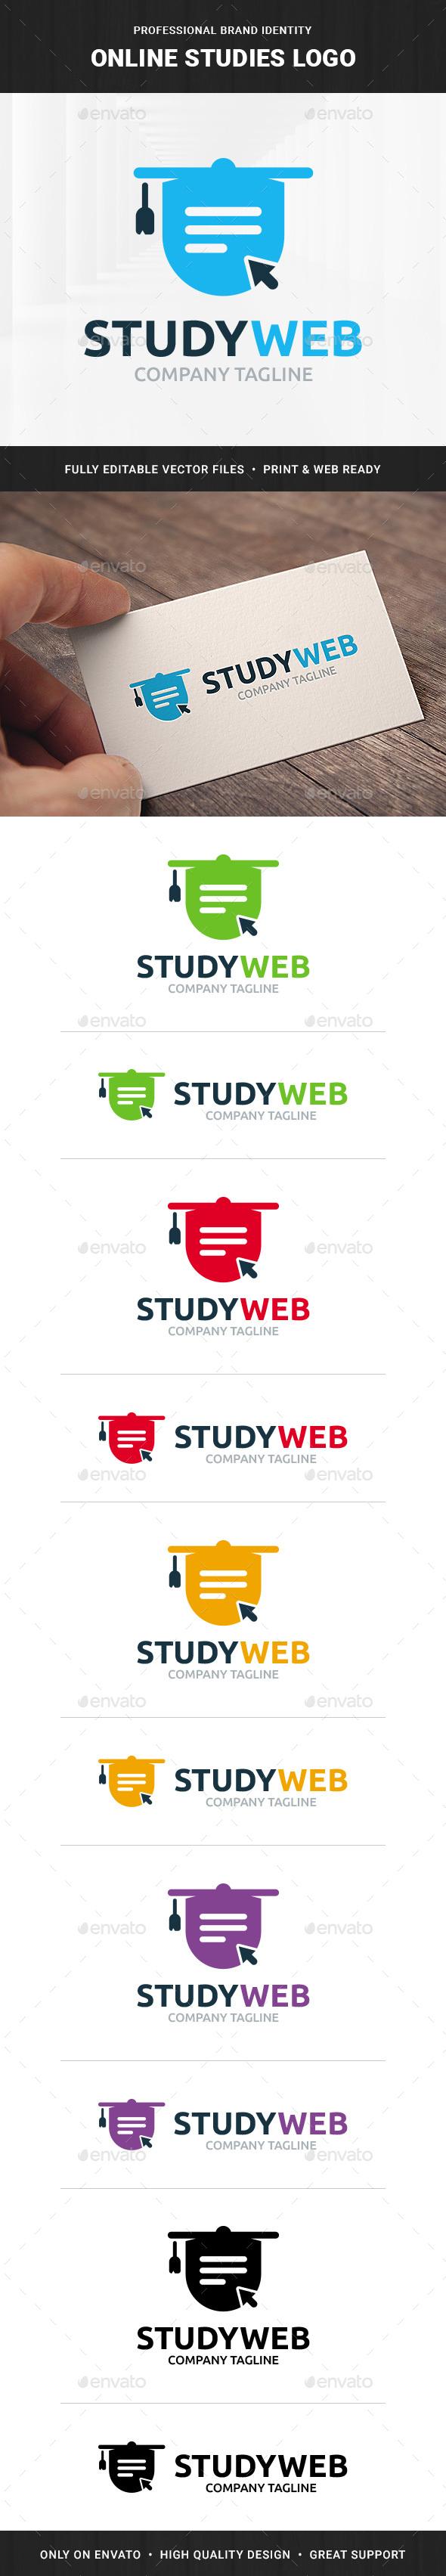 Online Studies Logo Template